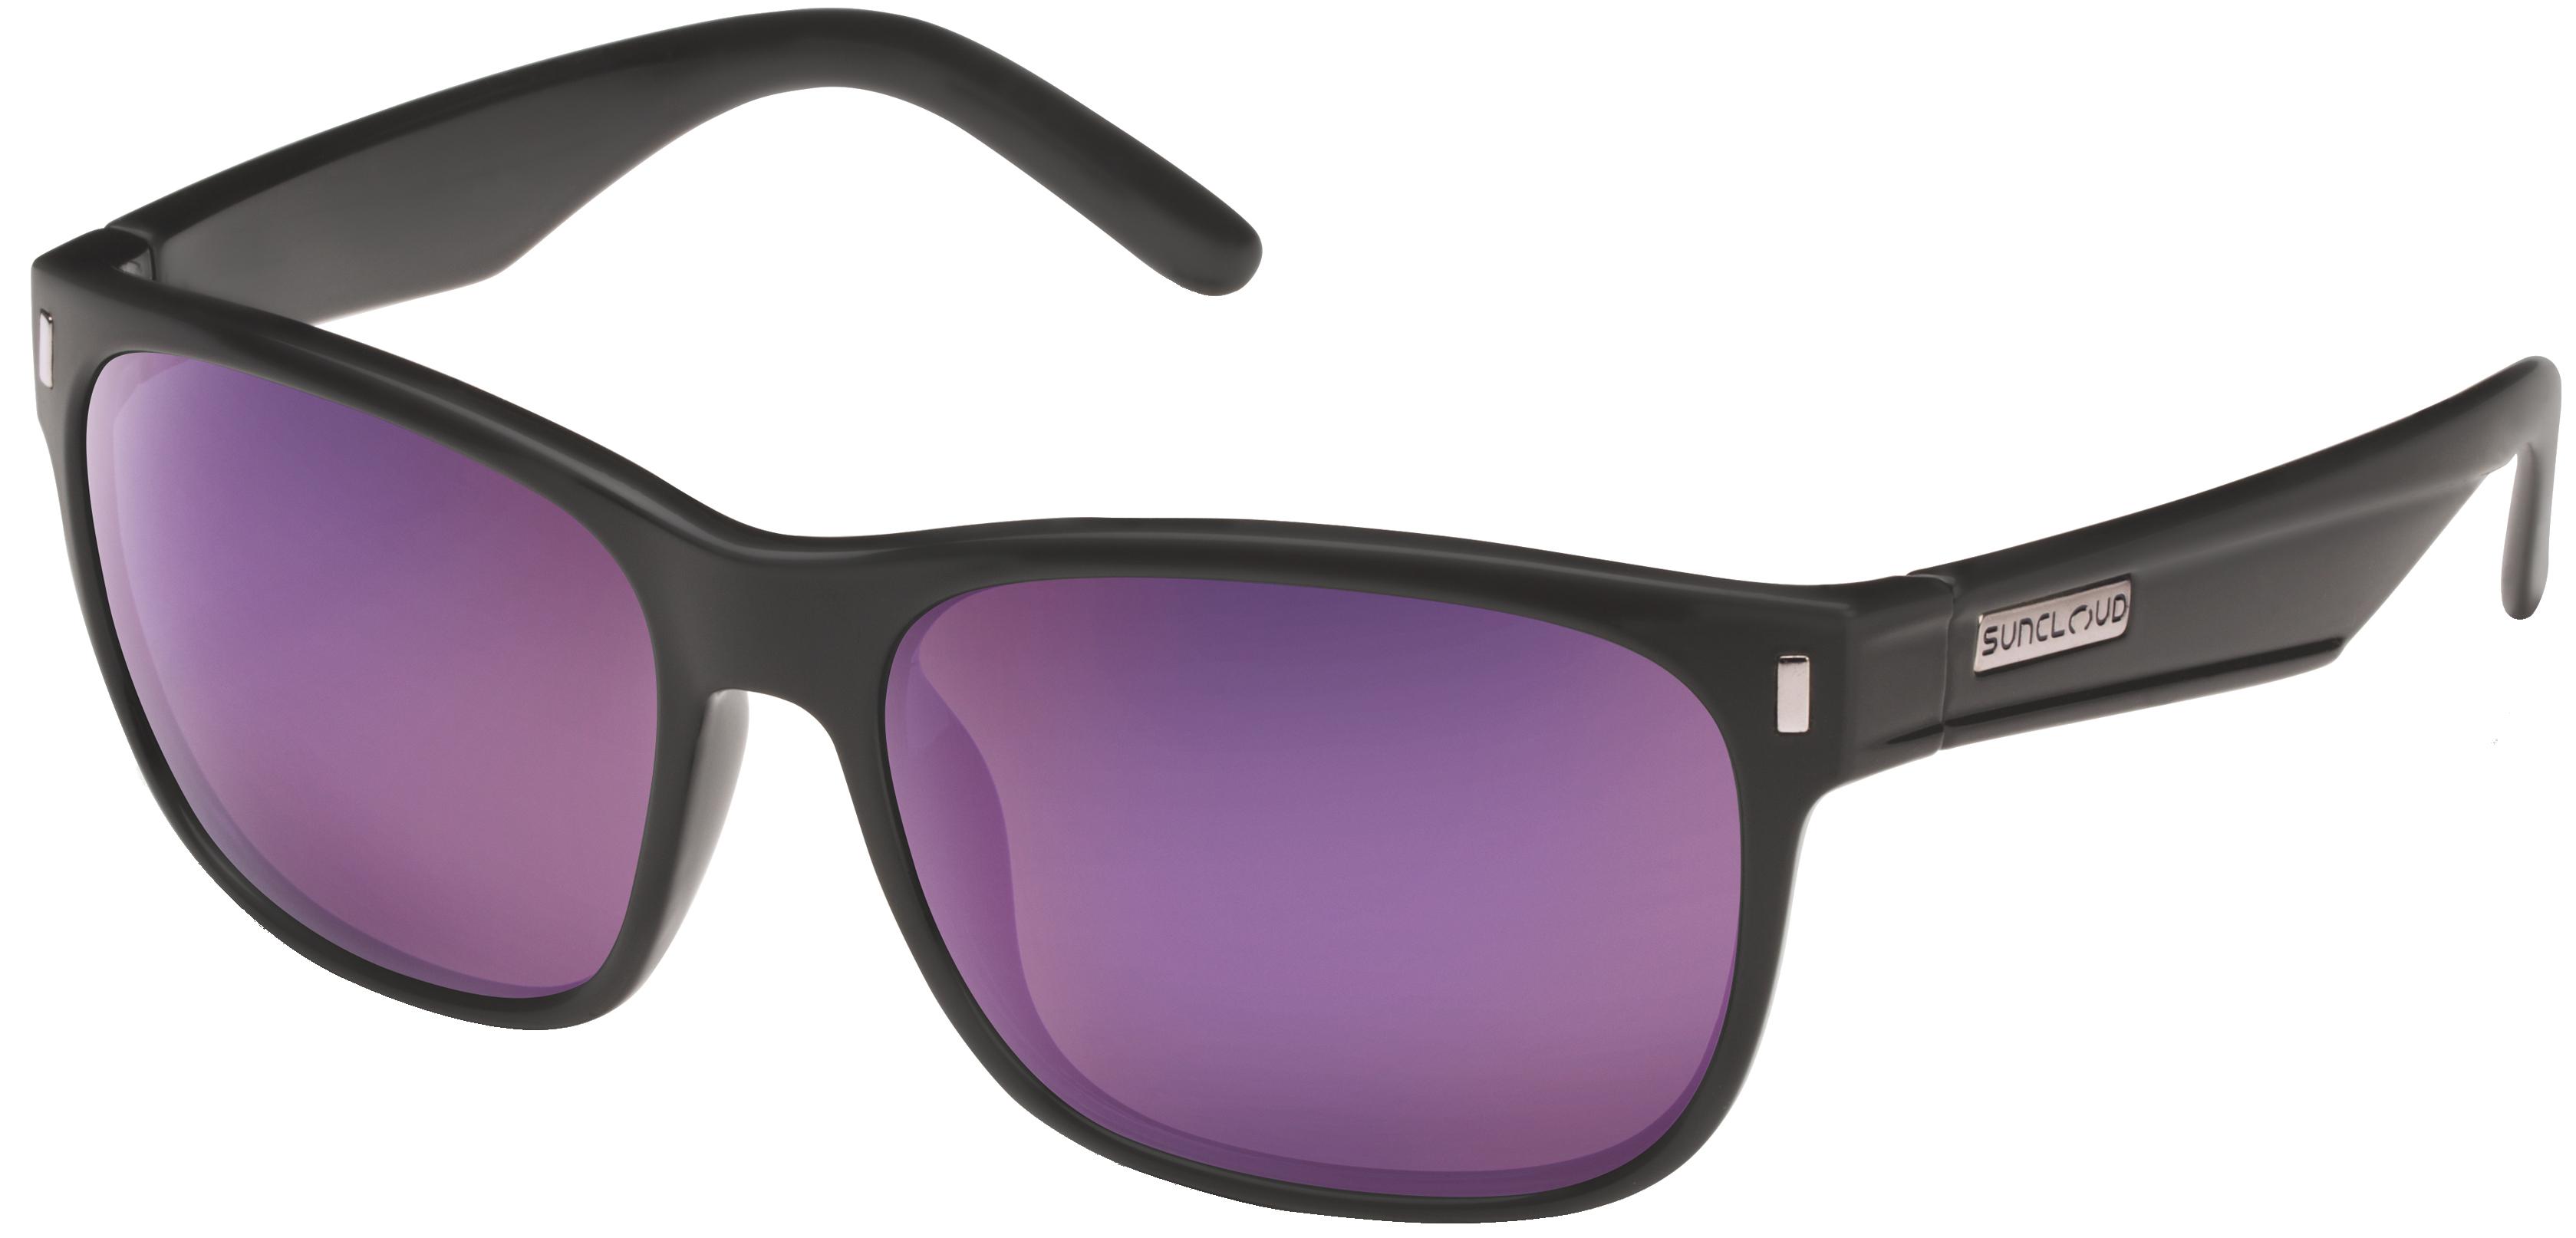 6fa91bbb13 Casual sunglasses